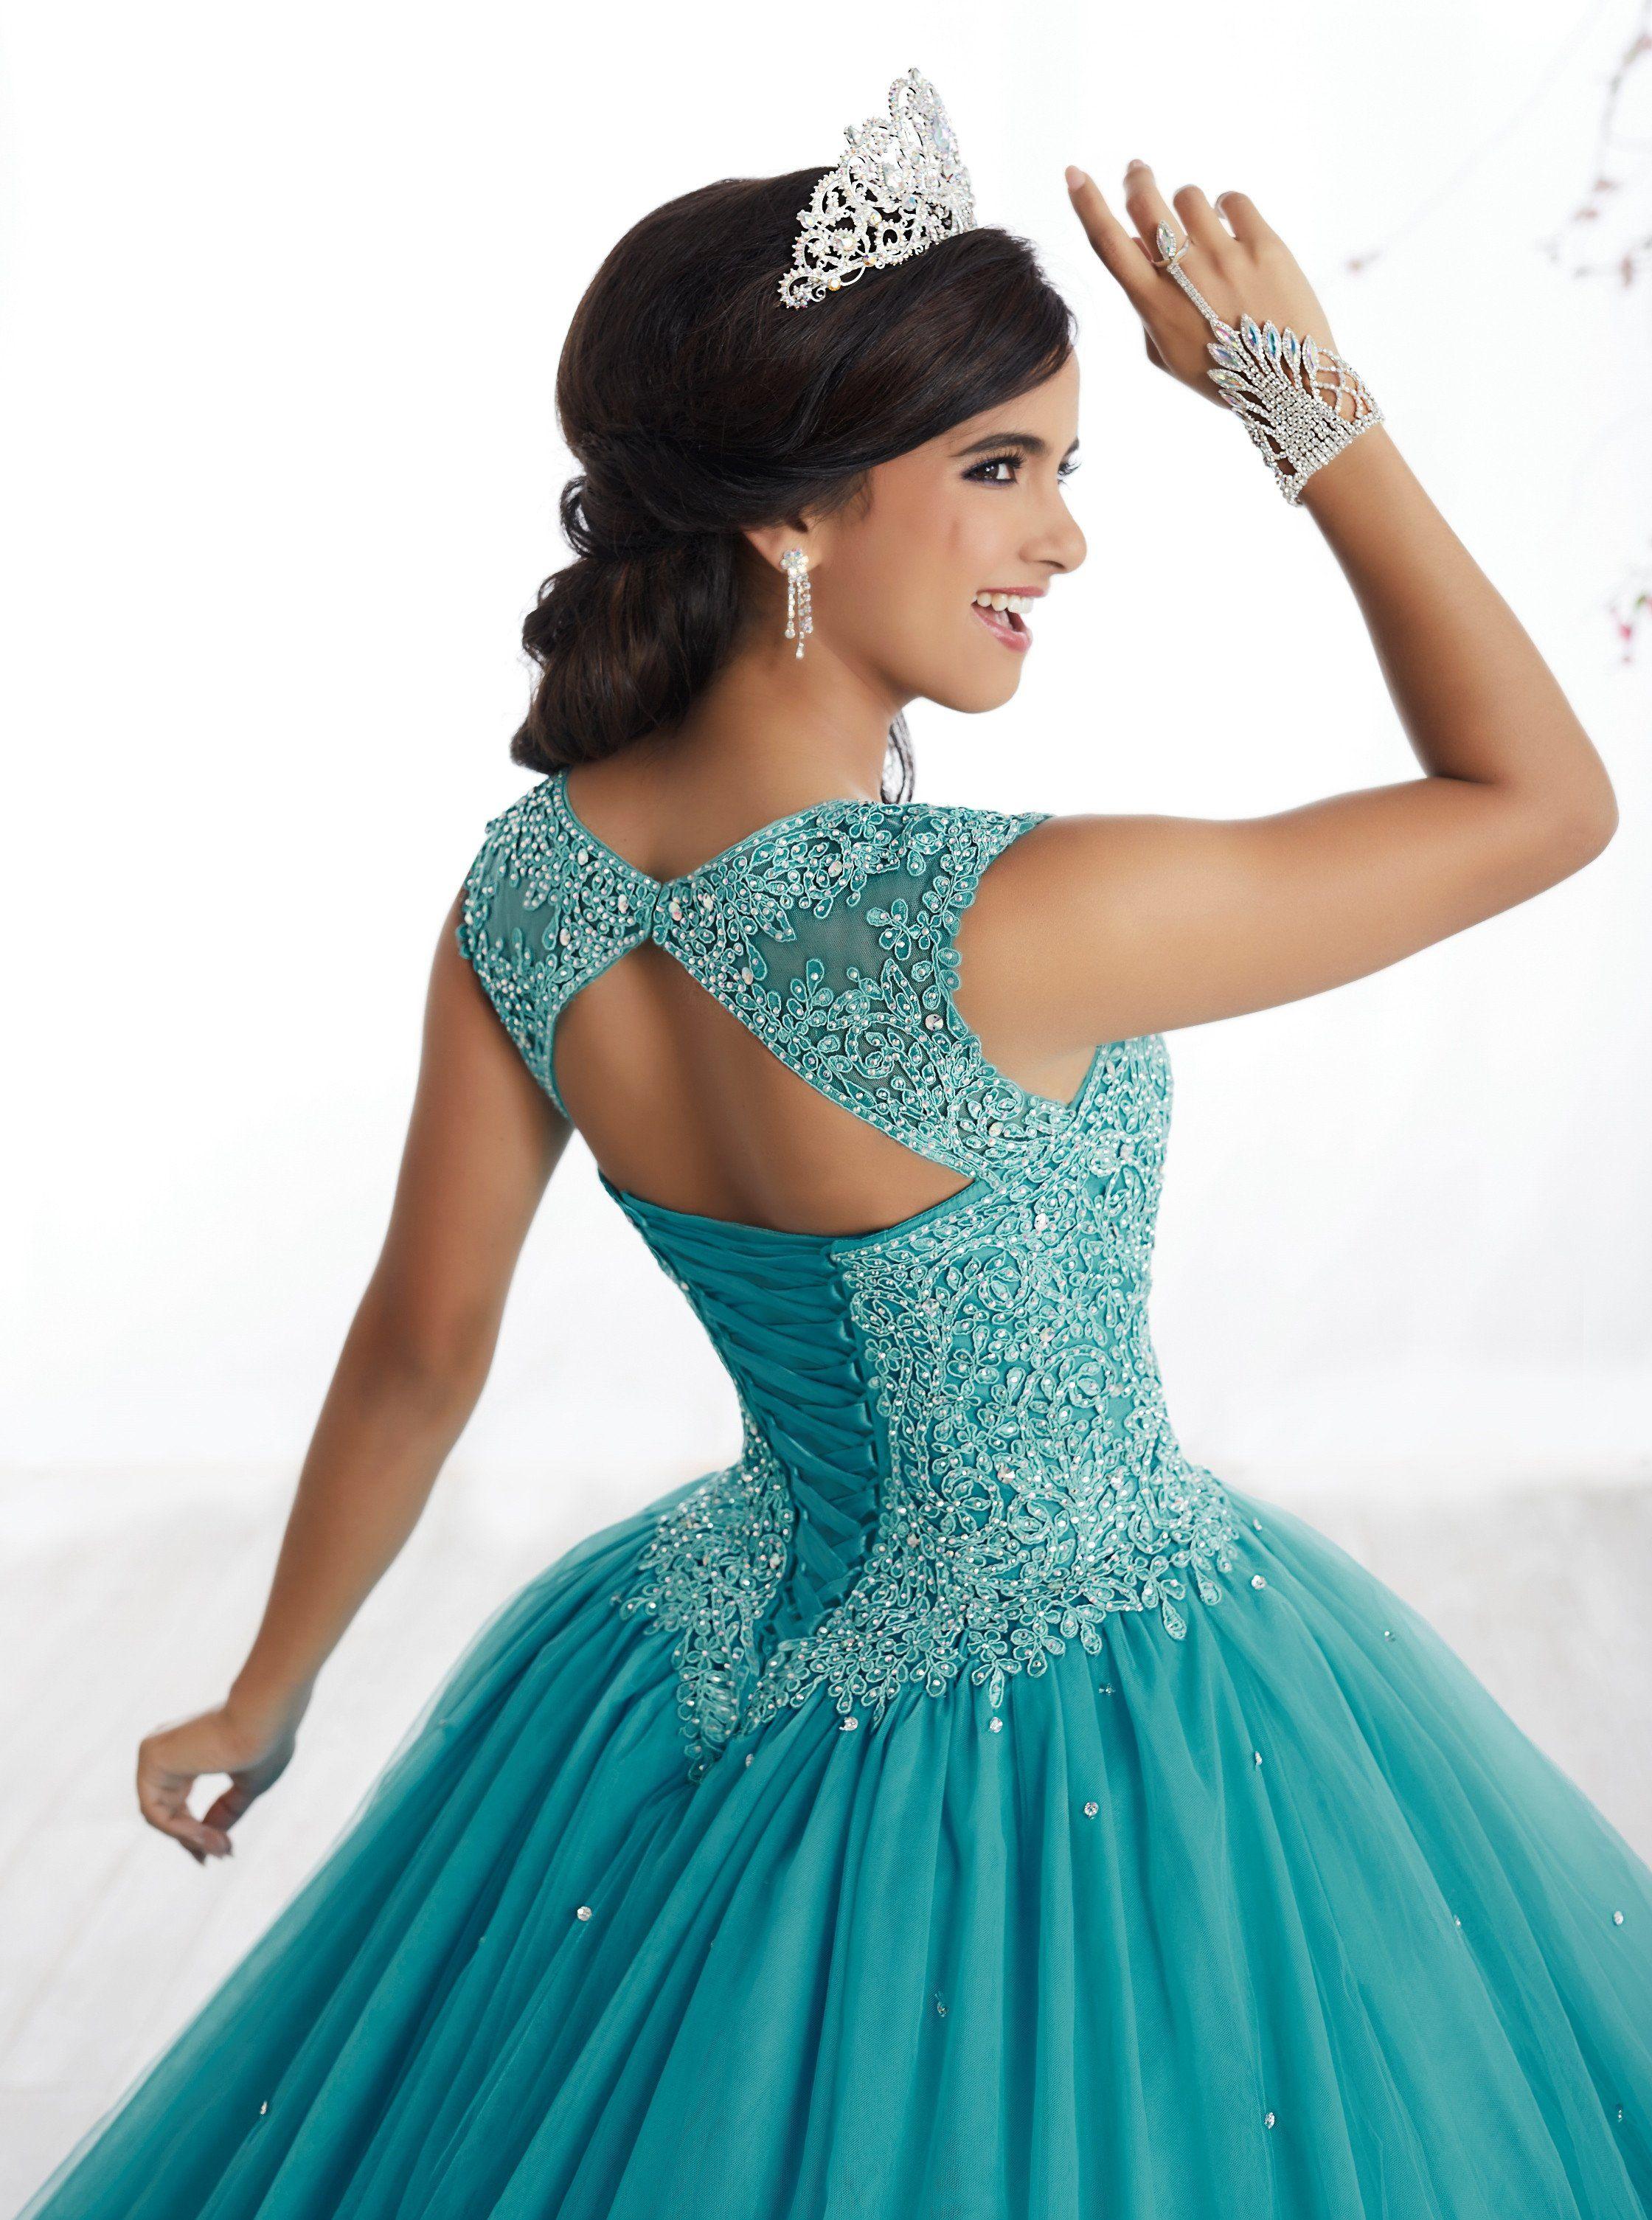 1d17e47cb2e Illusion Aline Quinceanera Dress by Fiesta Gowns 56329 en 2019